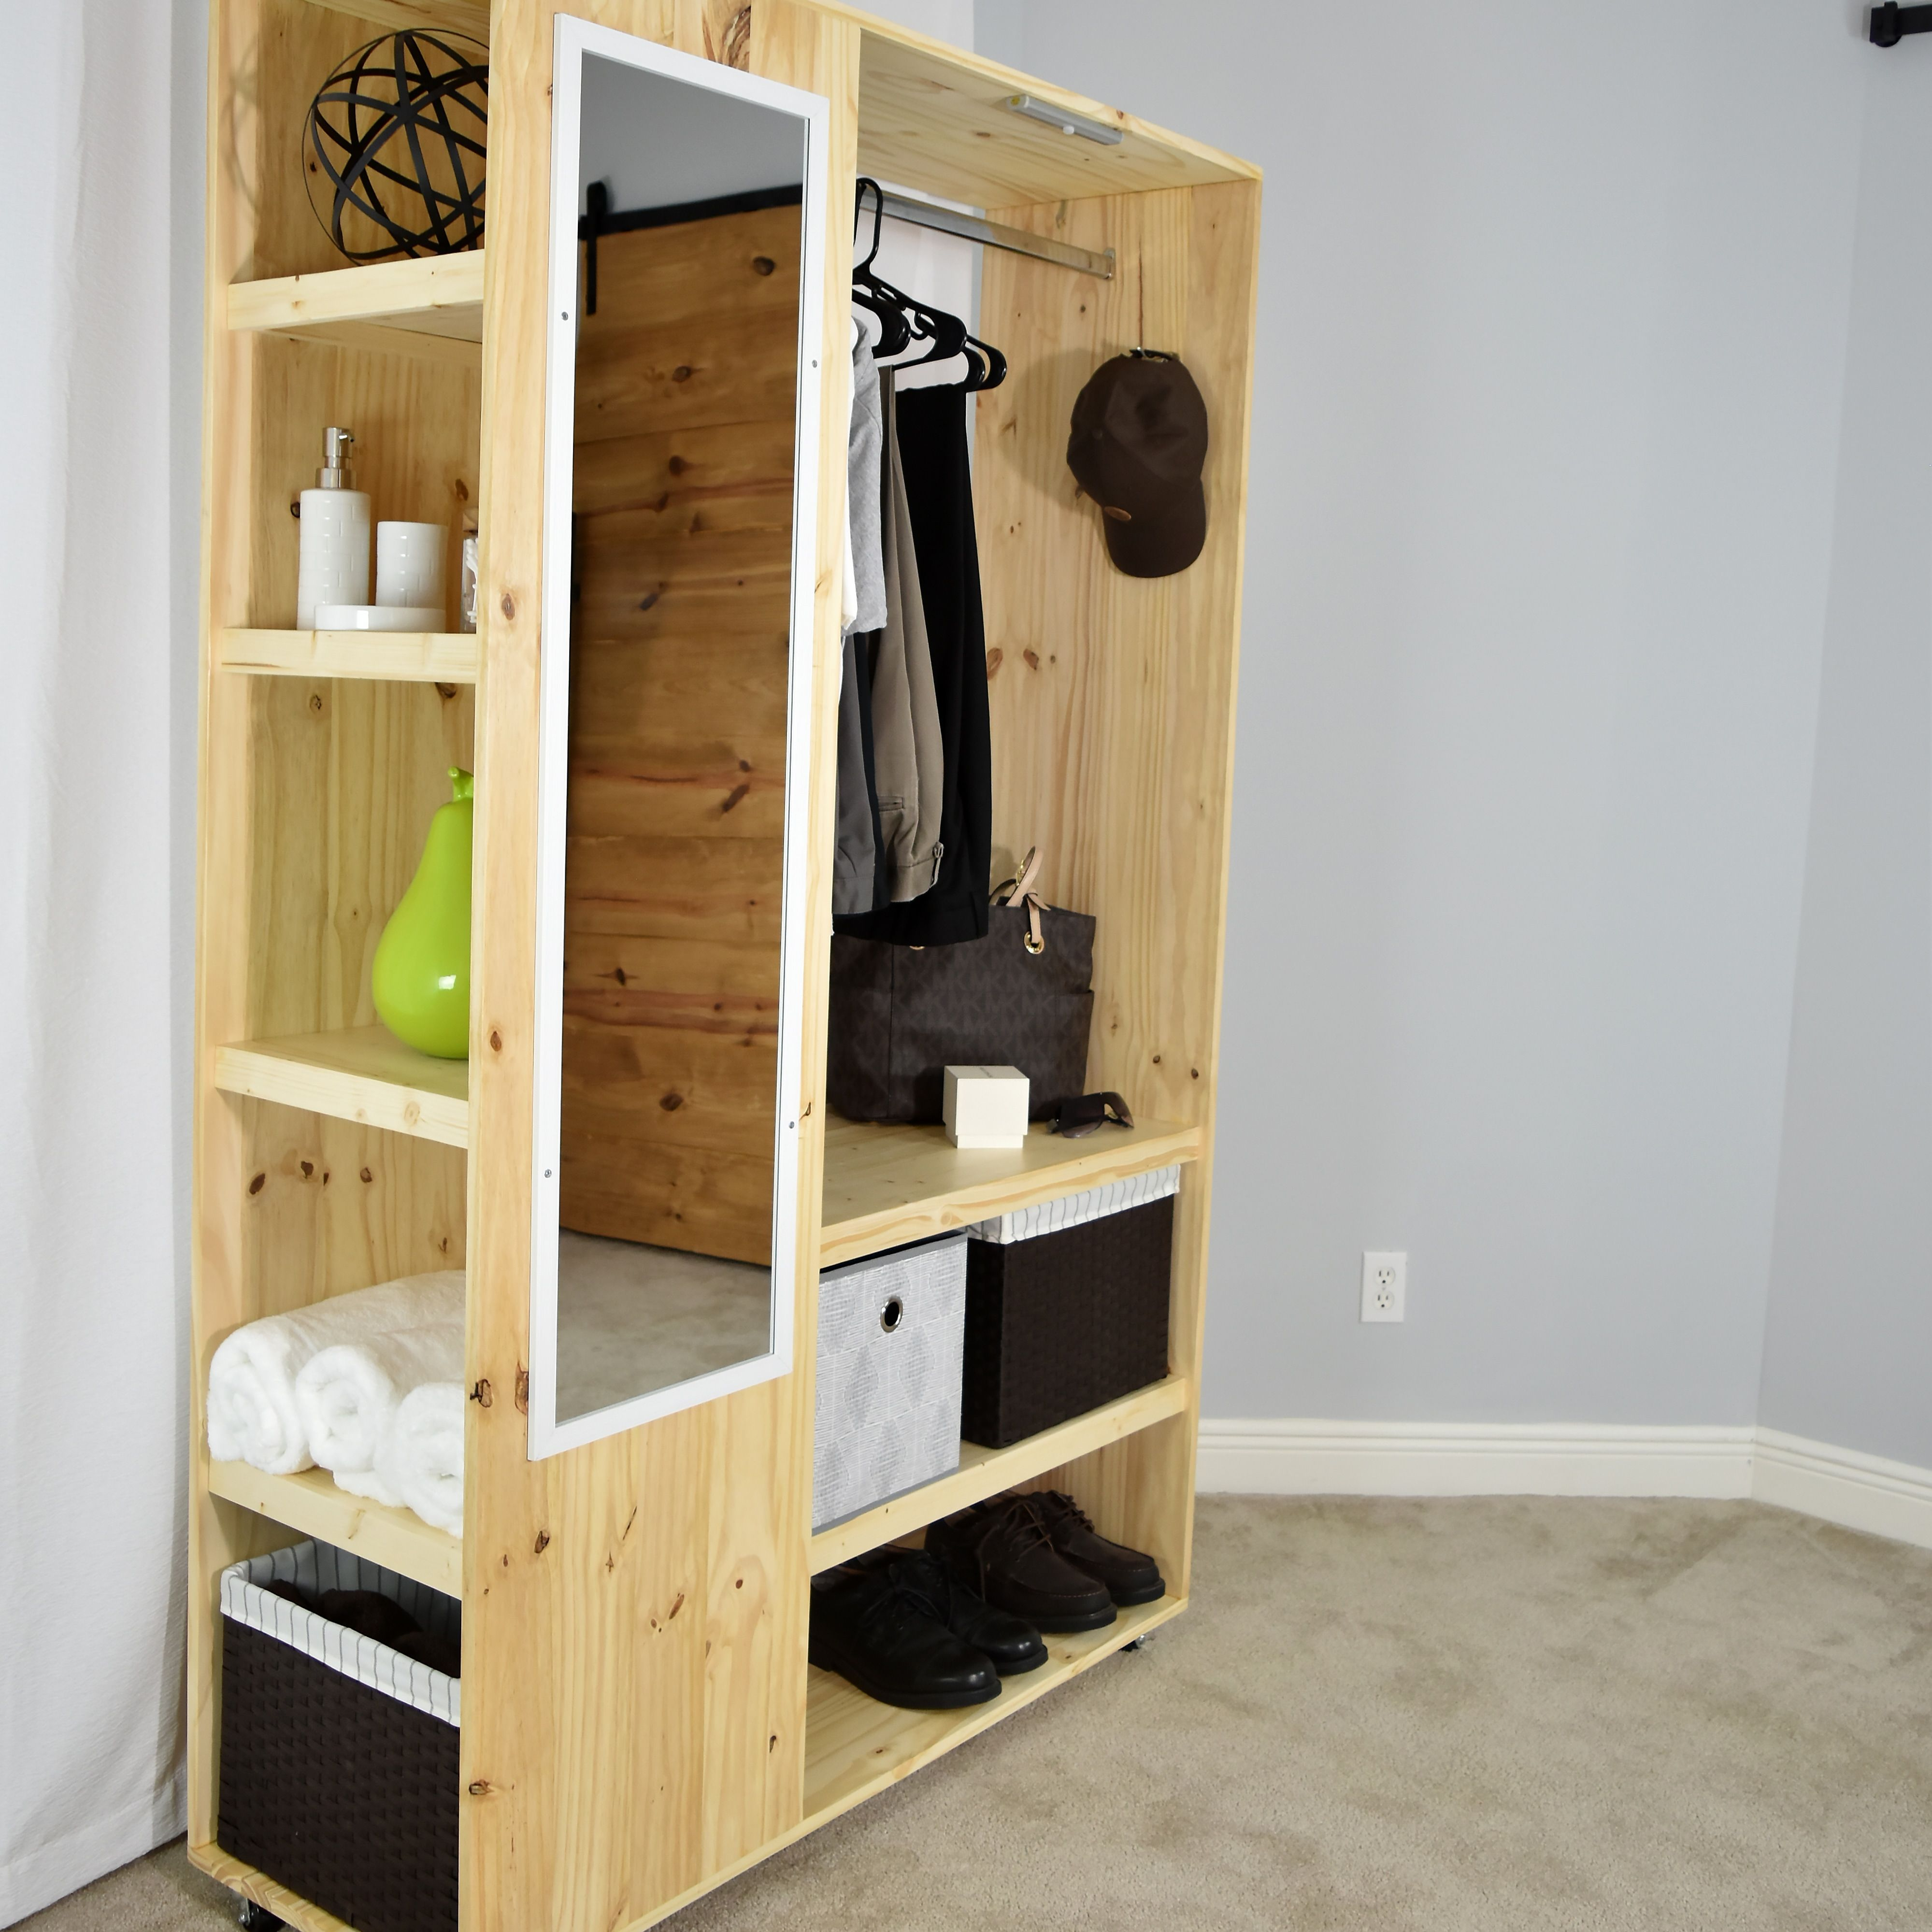 Diy Portable Closet Organizer Pdf Plan In 2020 Portable Closet